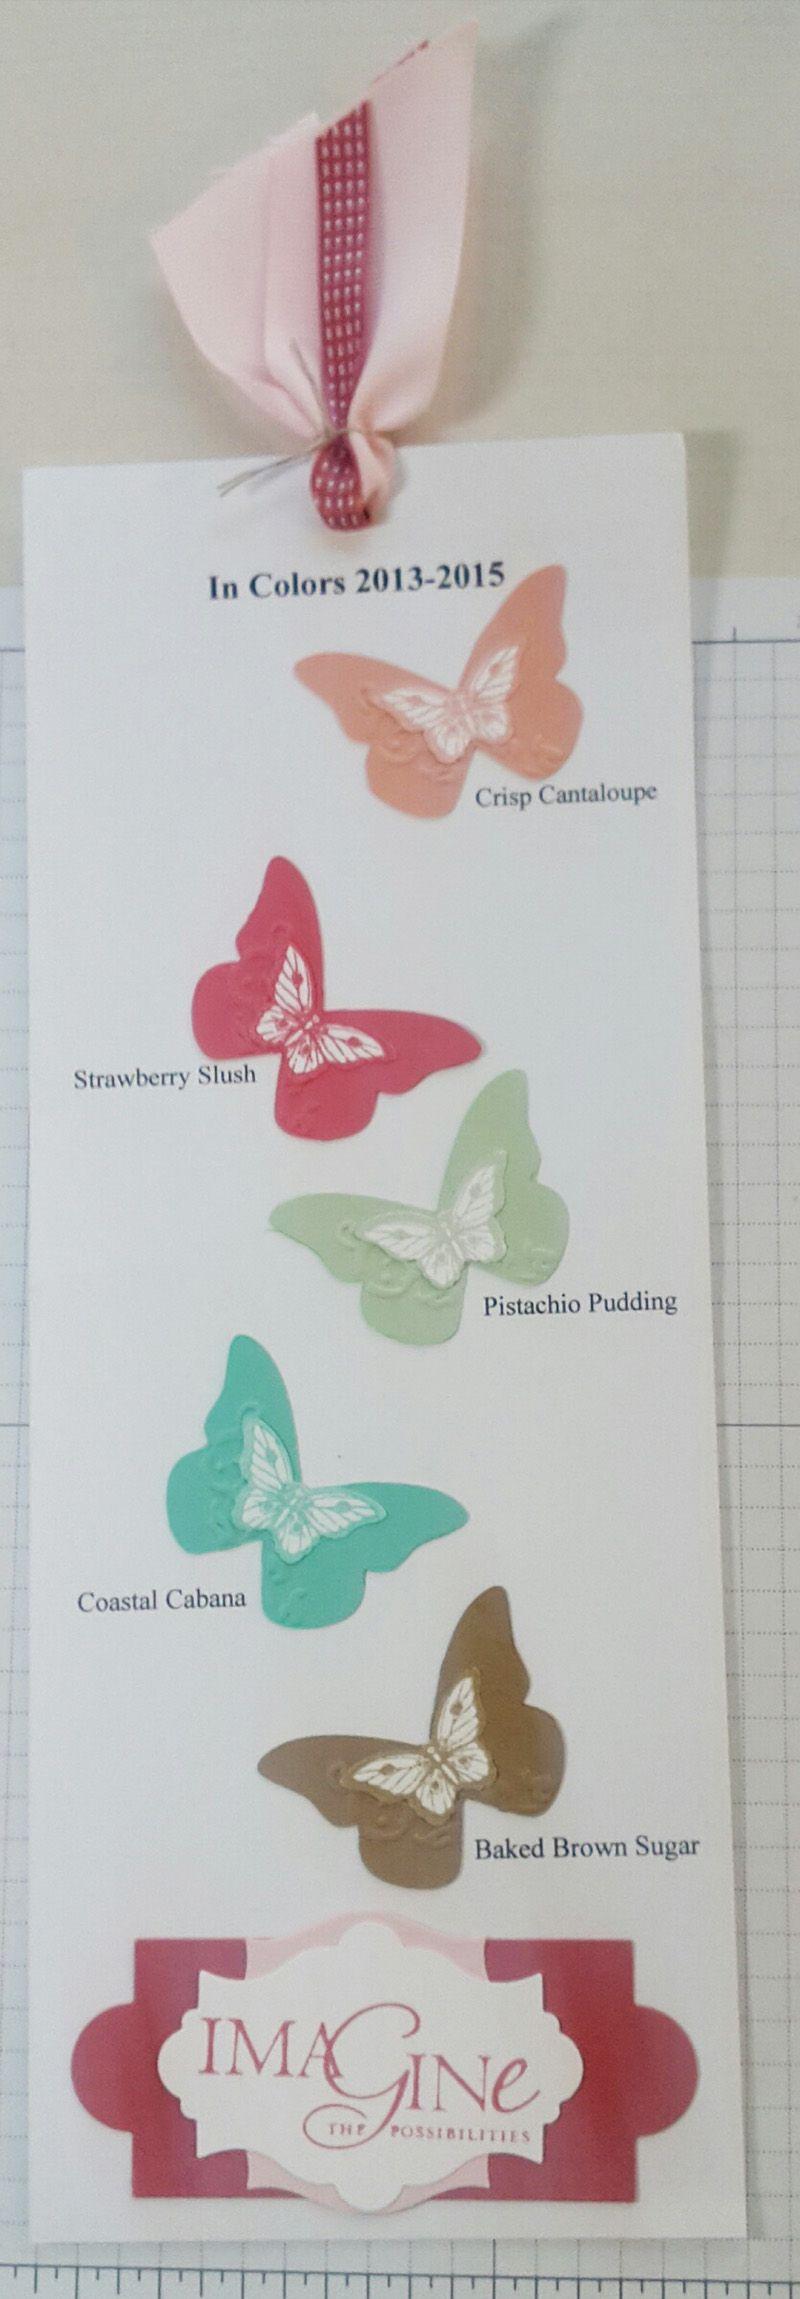 Sangay | Z - # 15 Butterflies | Pinterest